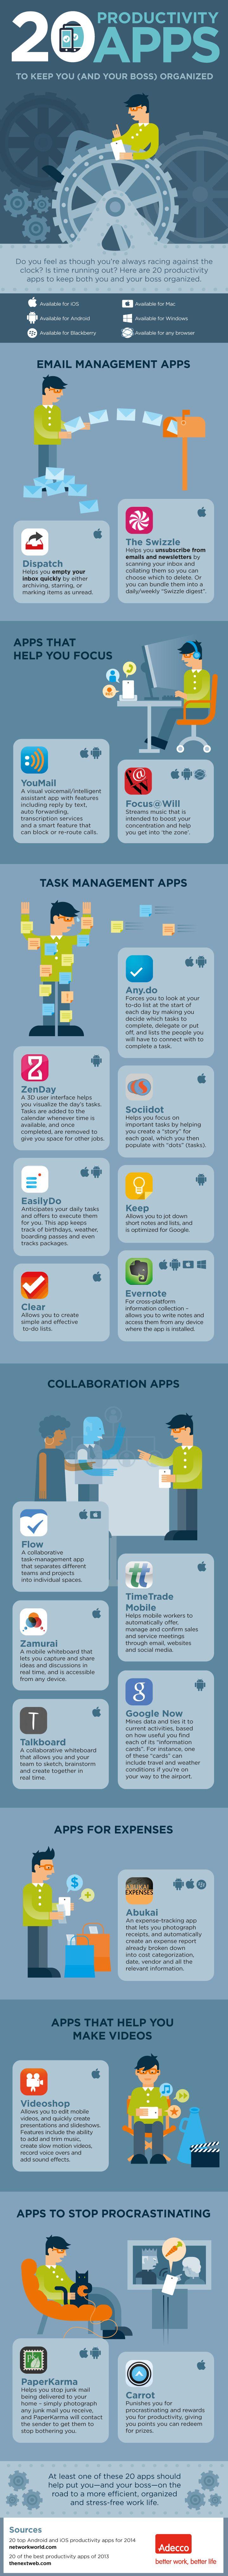 Las 20 mejores APPs de productividad #infografia #infographic #software